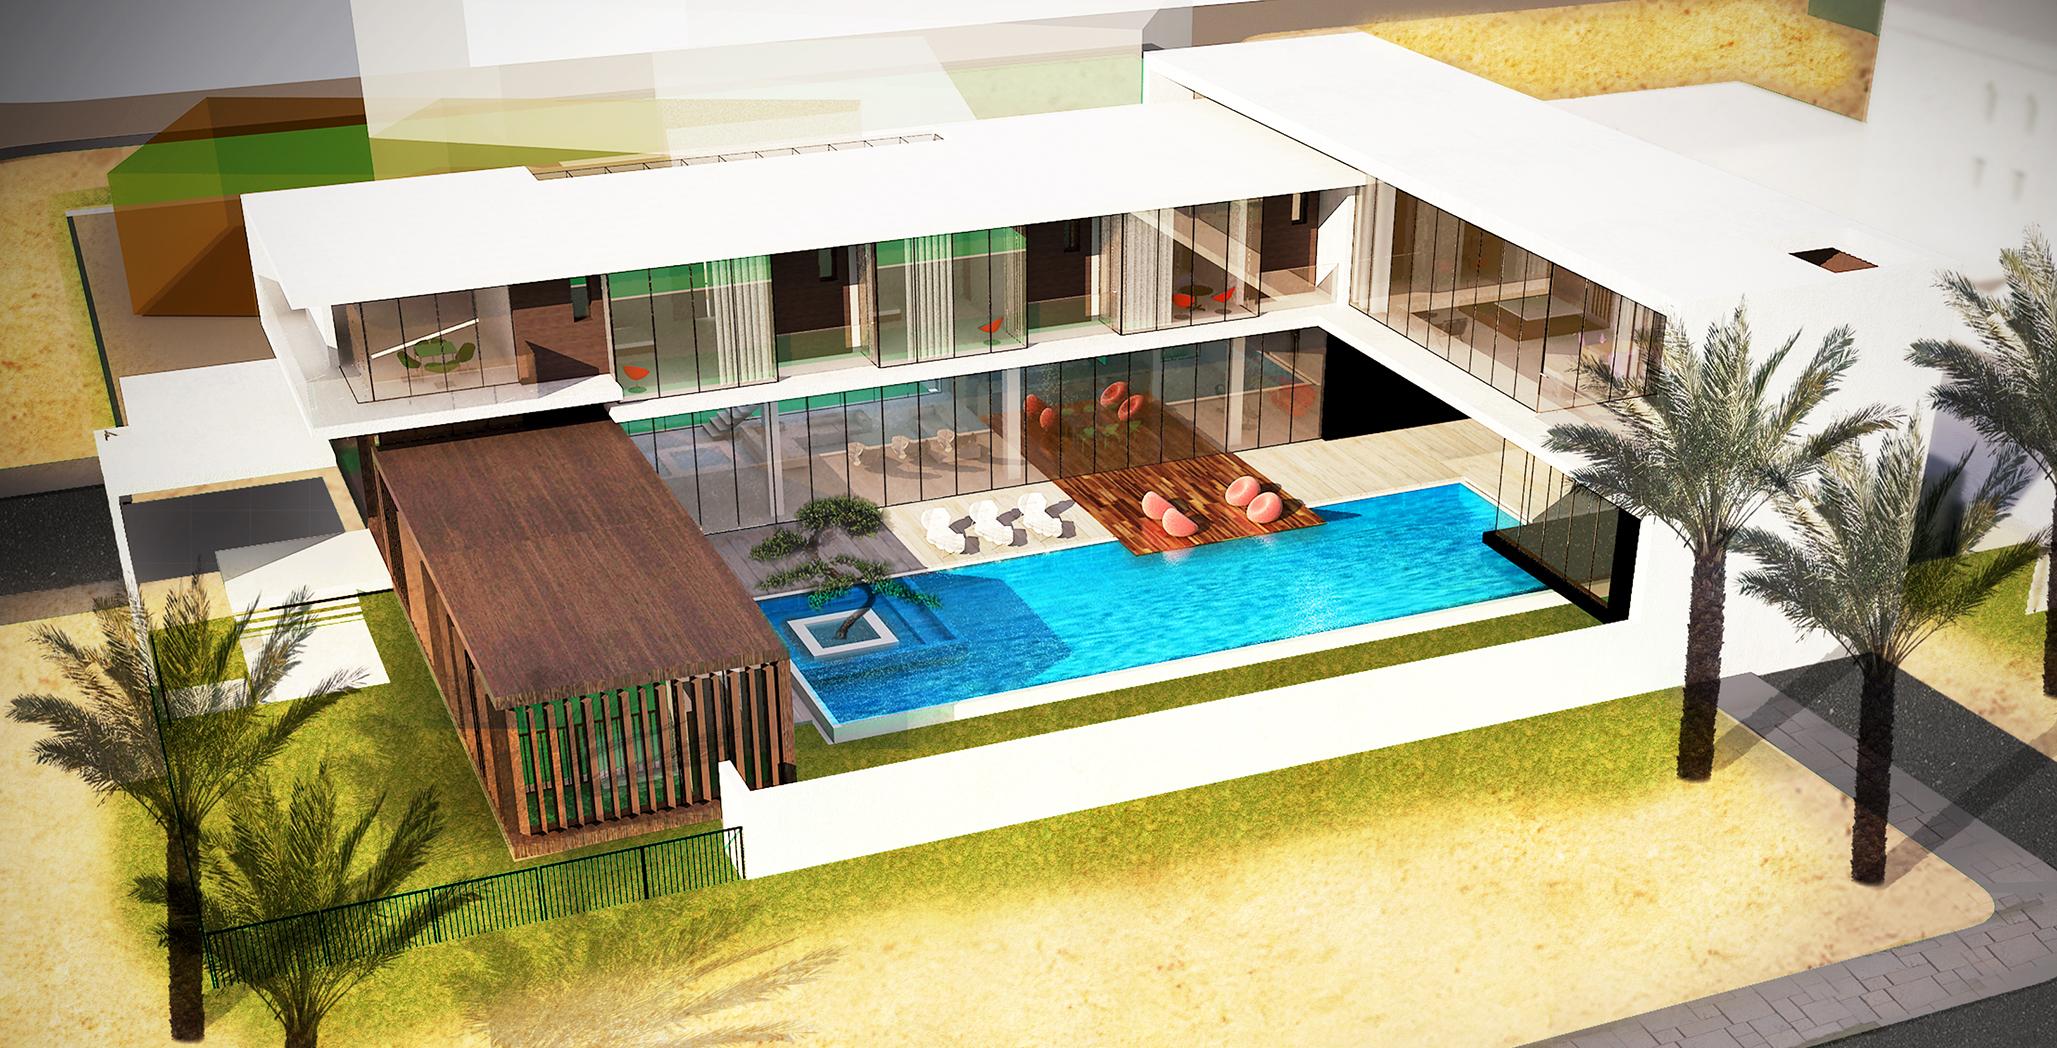 BEAD Contemporary villa 1 top view.JPG